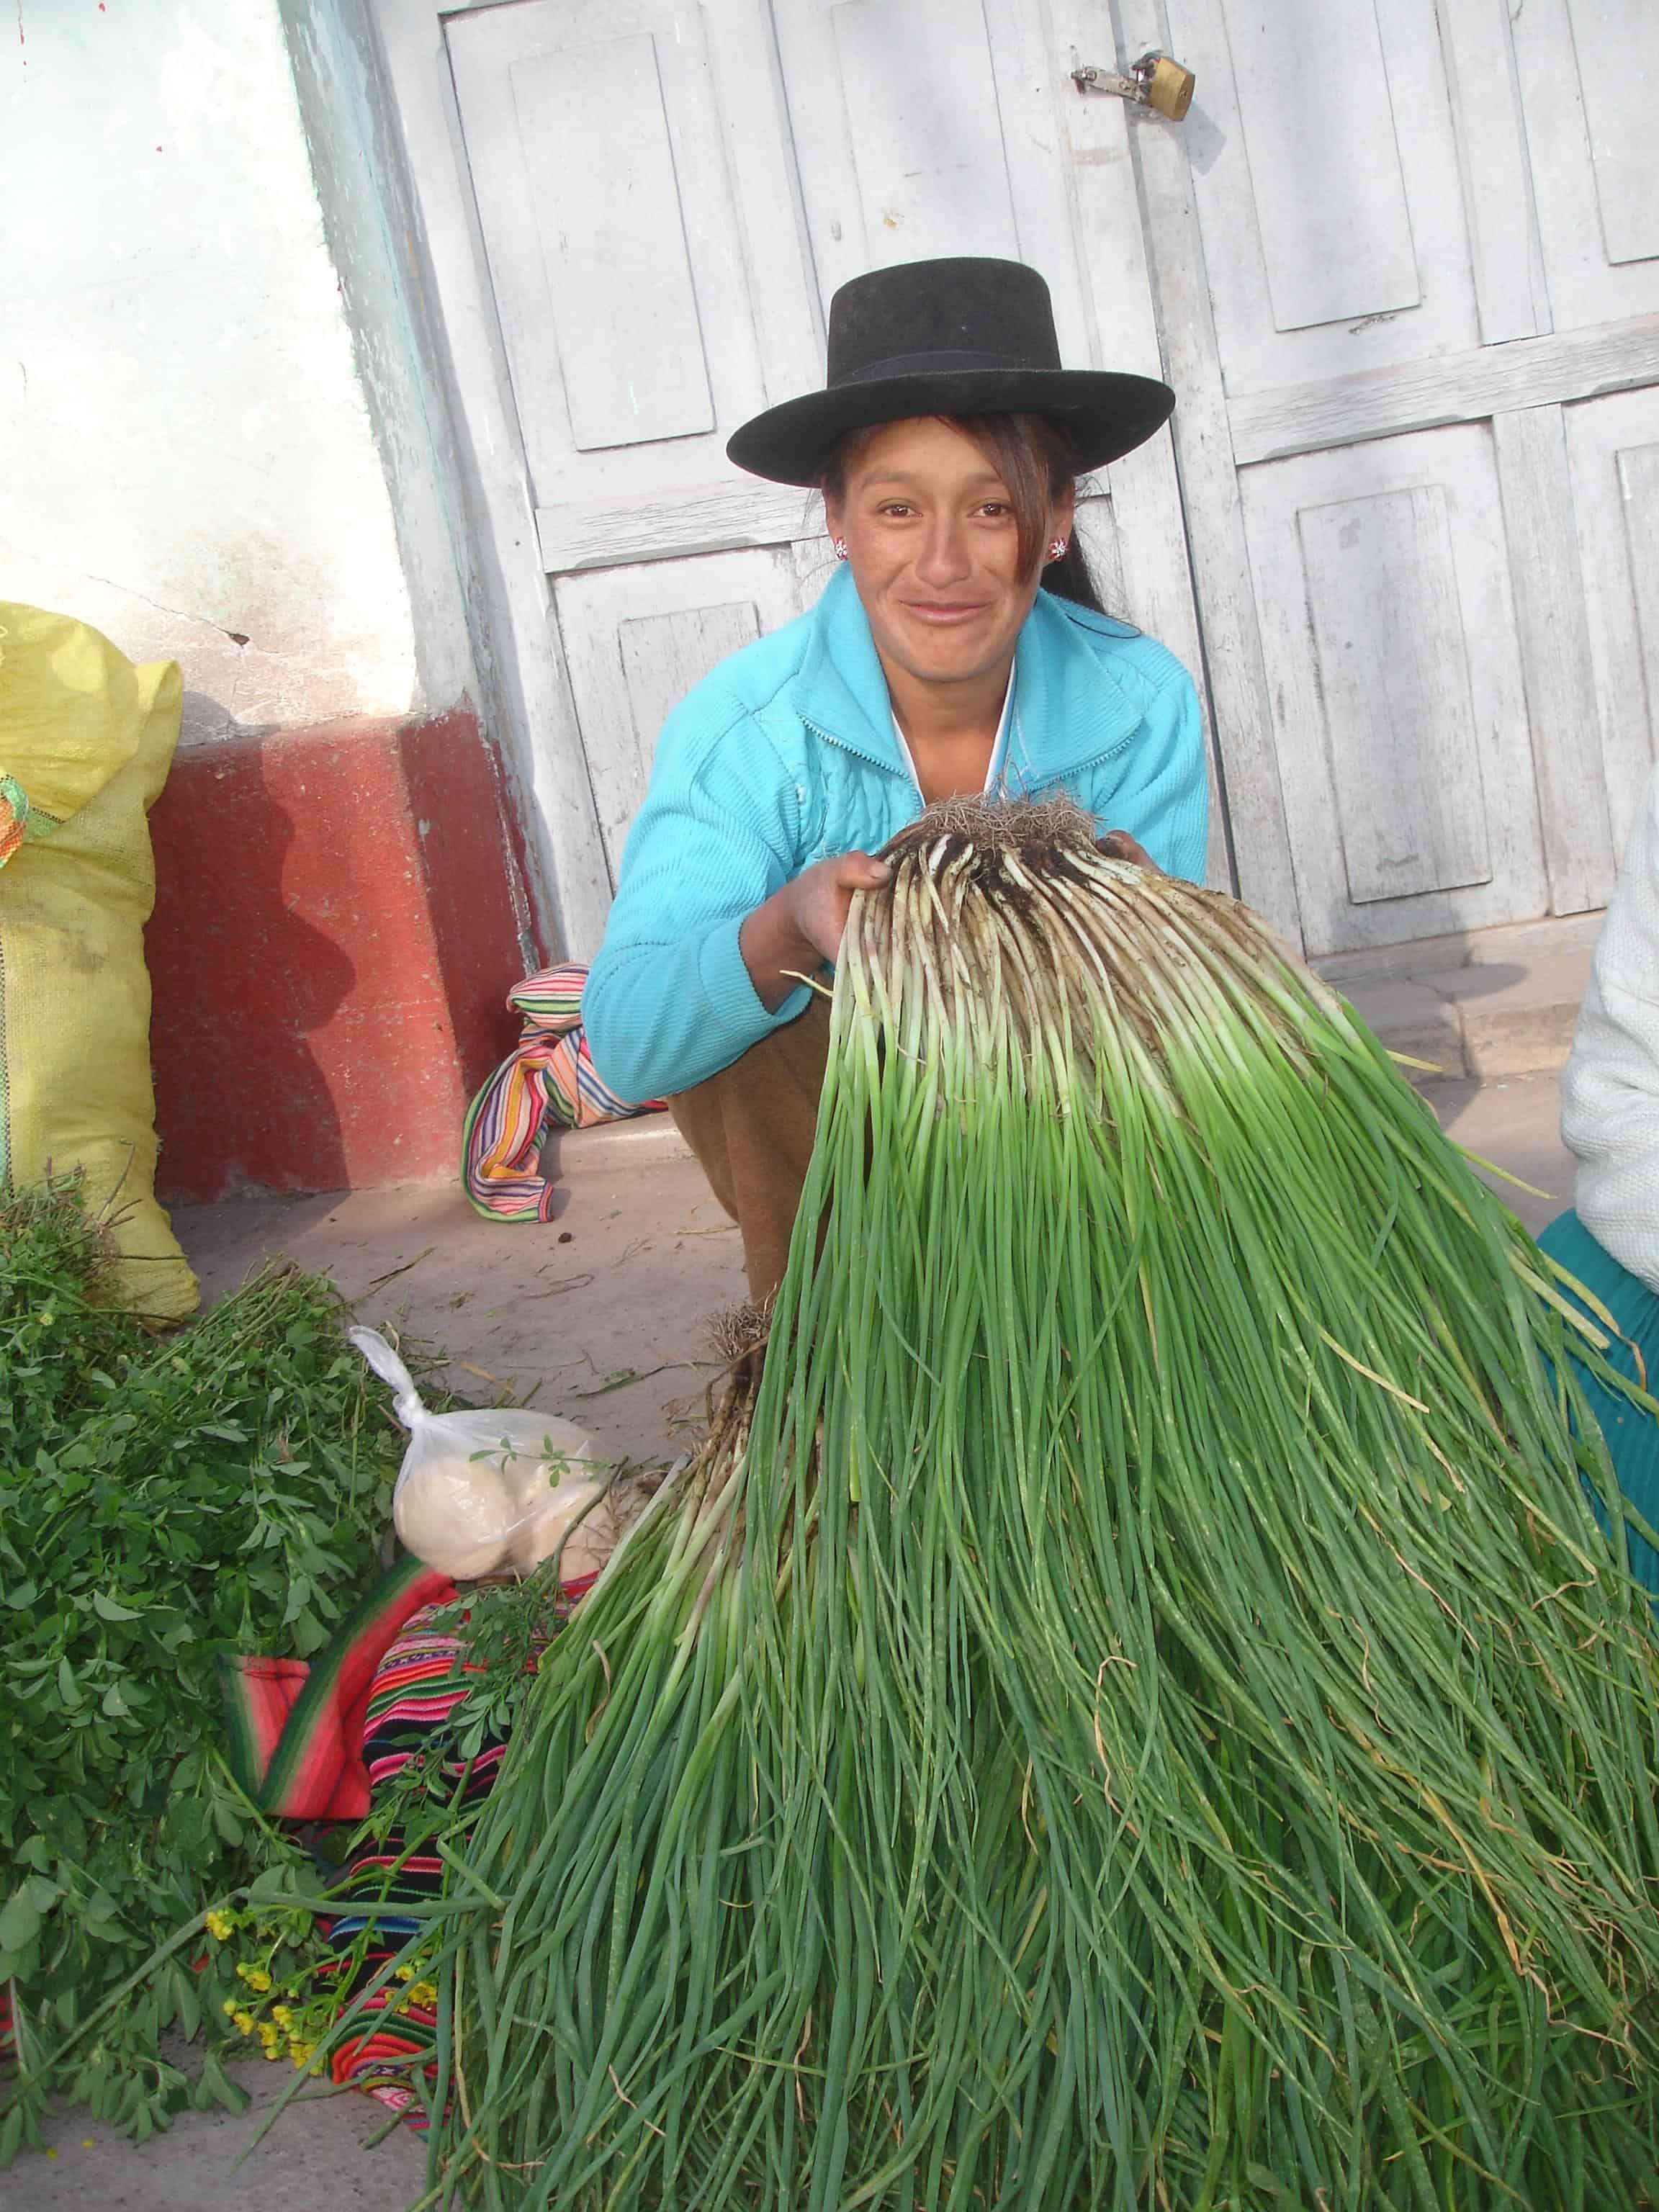 Archive-Peru-Tadepa-2